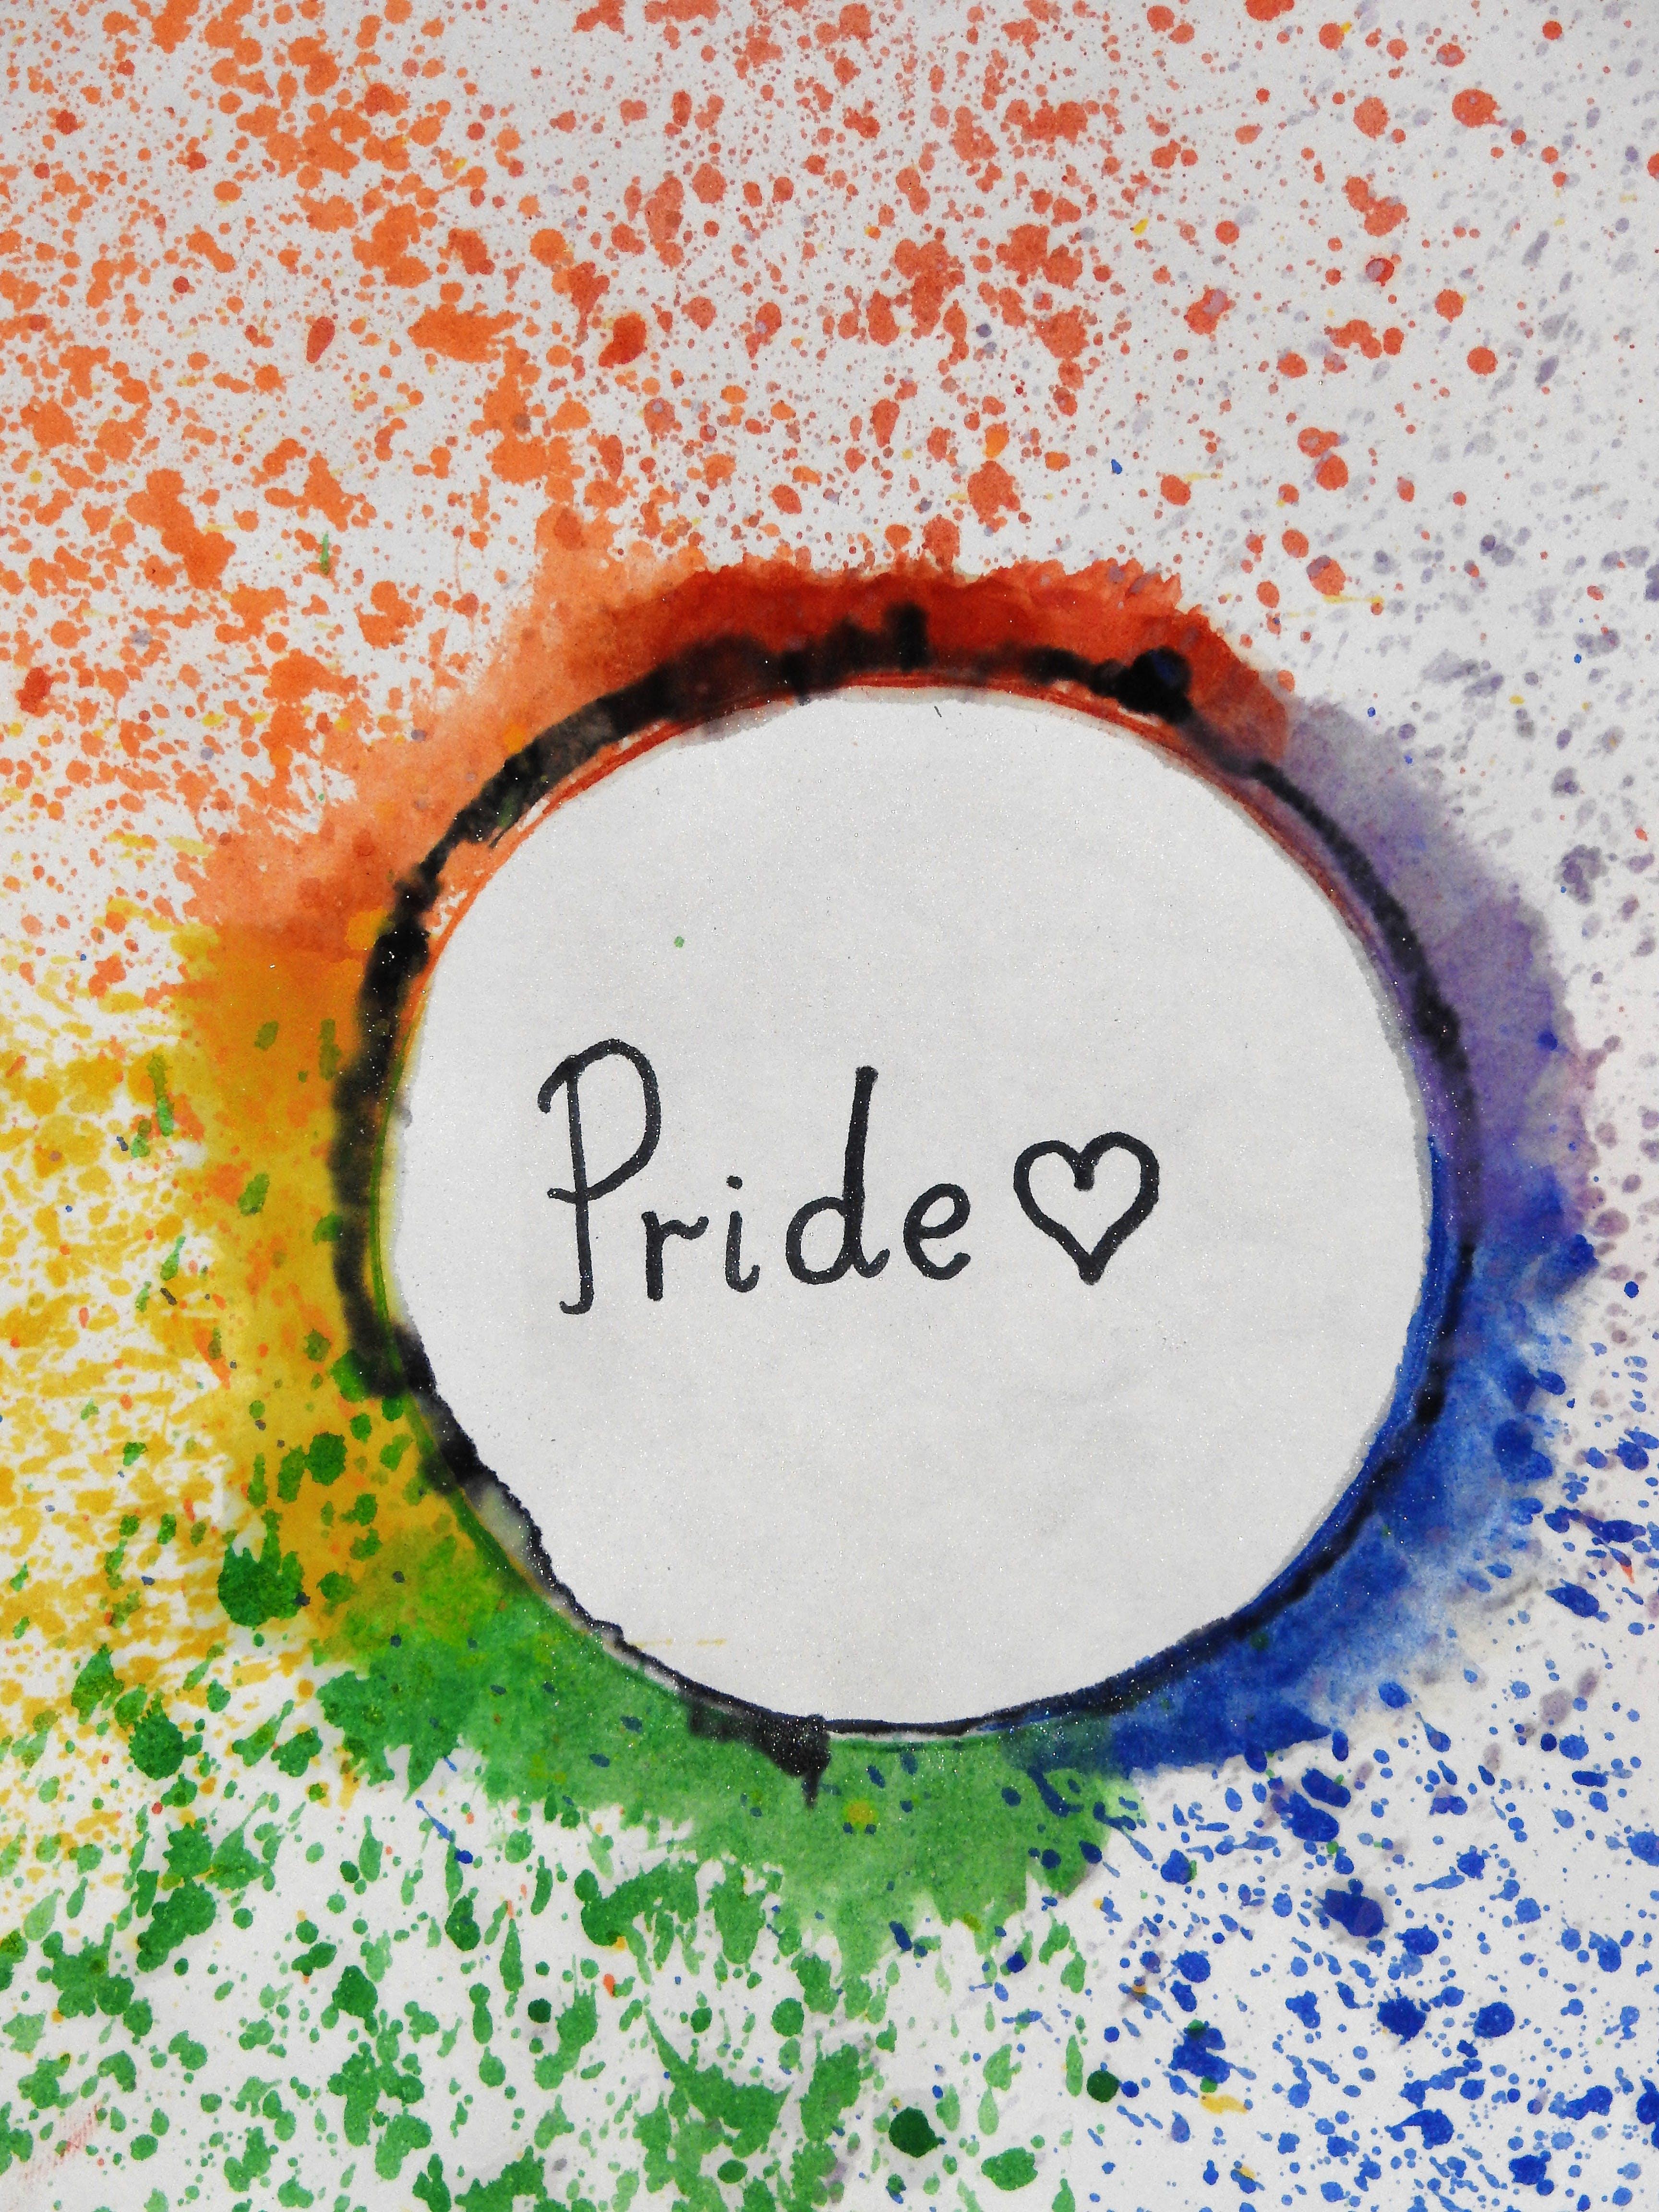 Pride Text Overlay